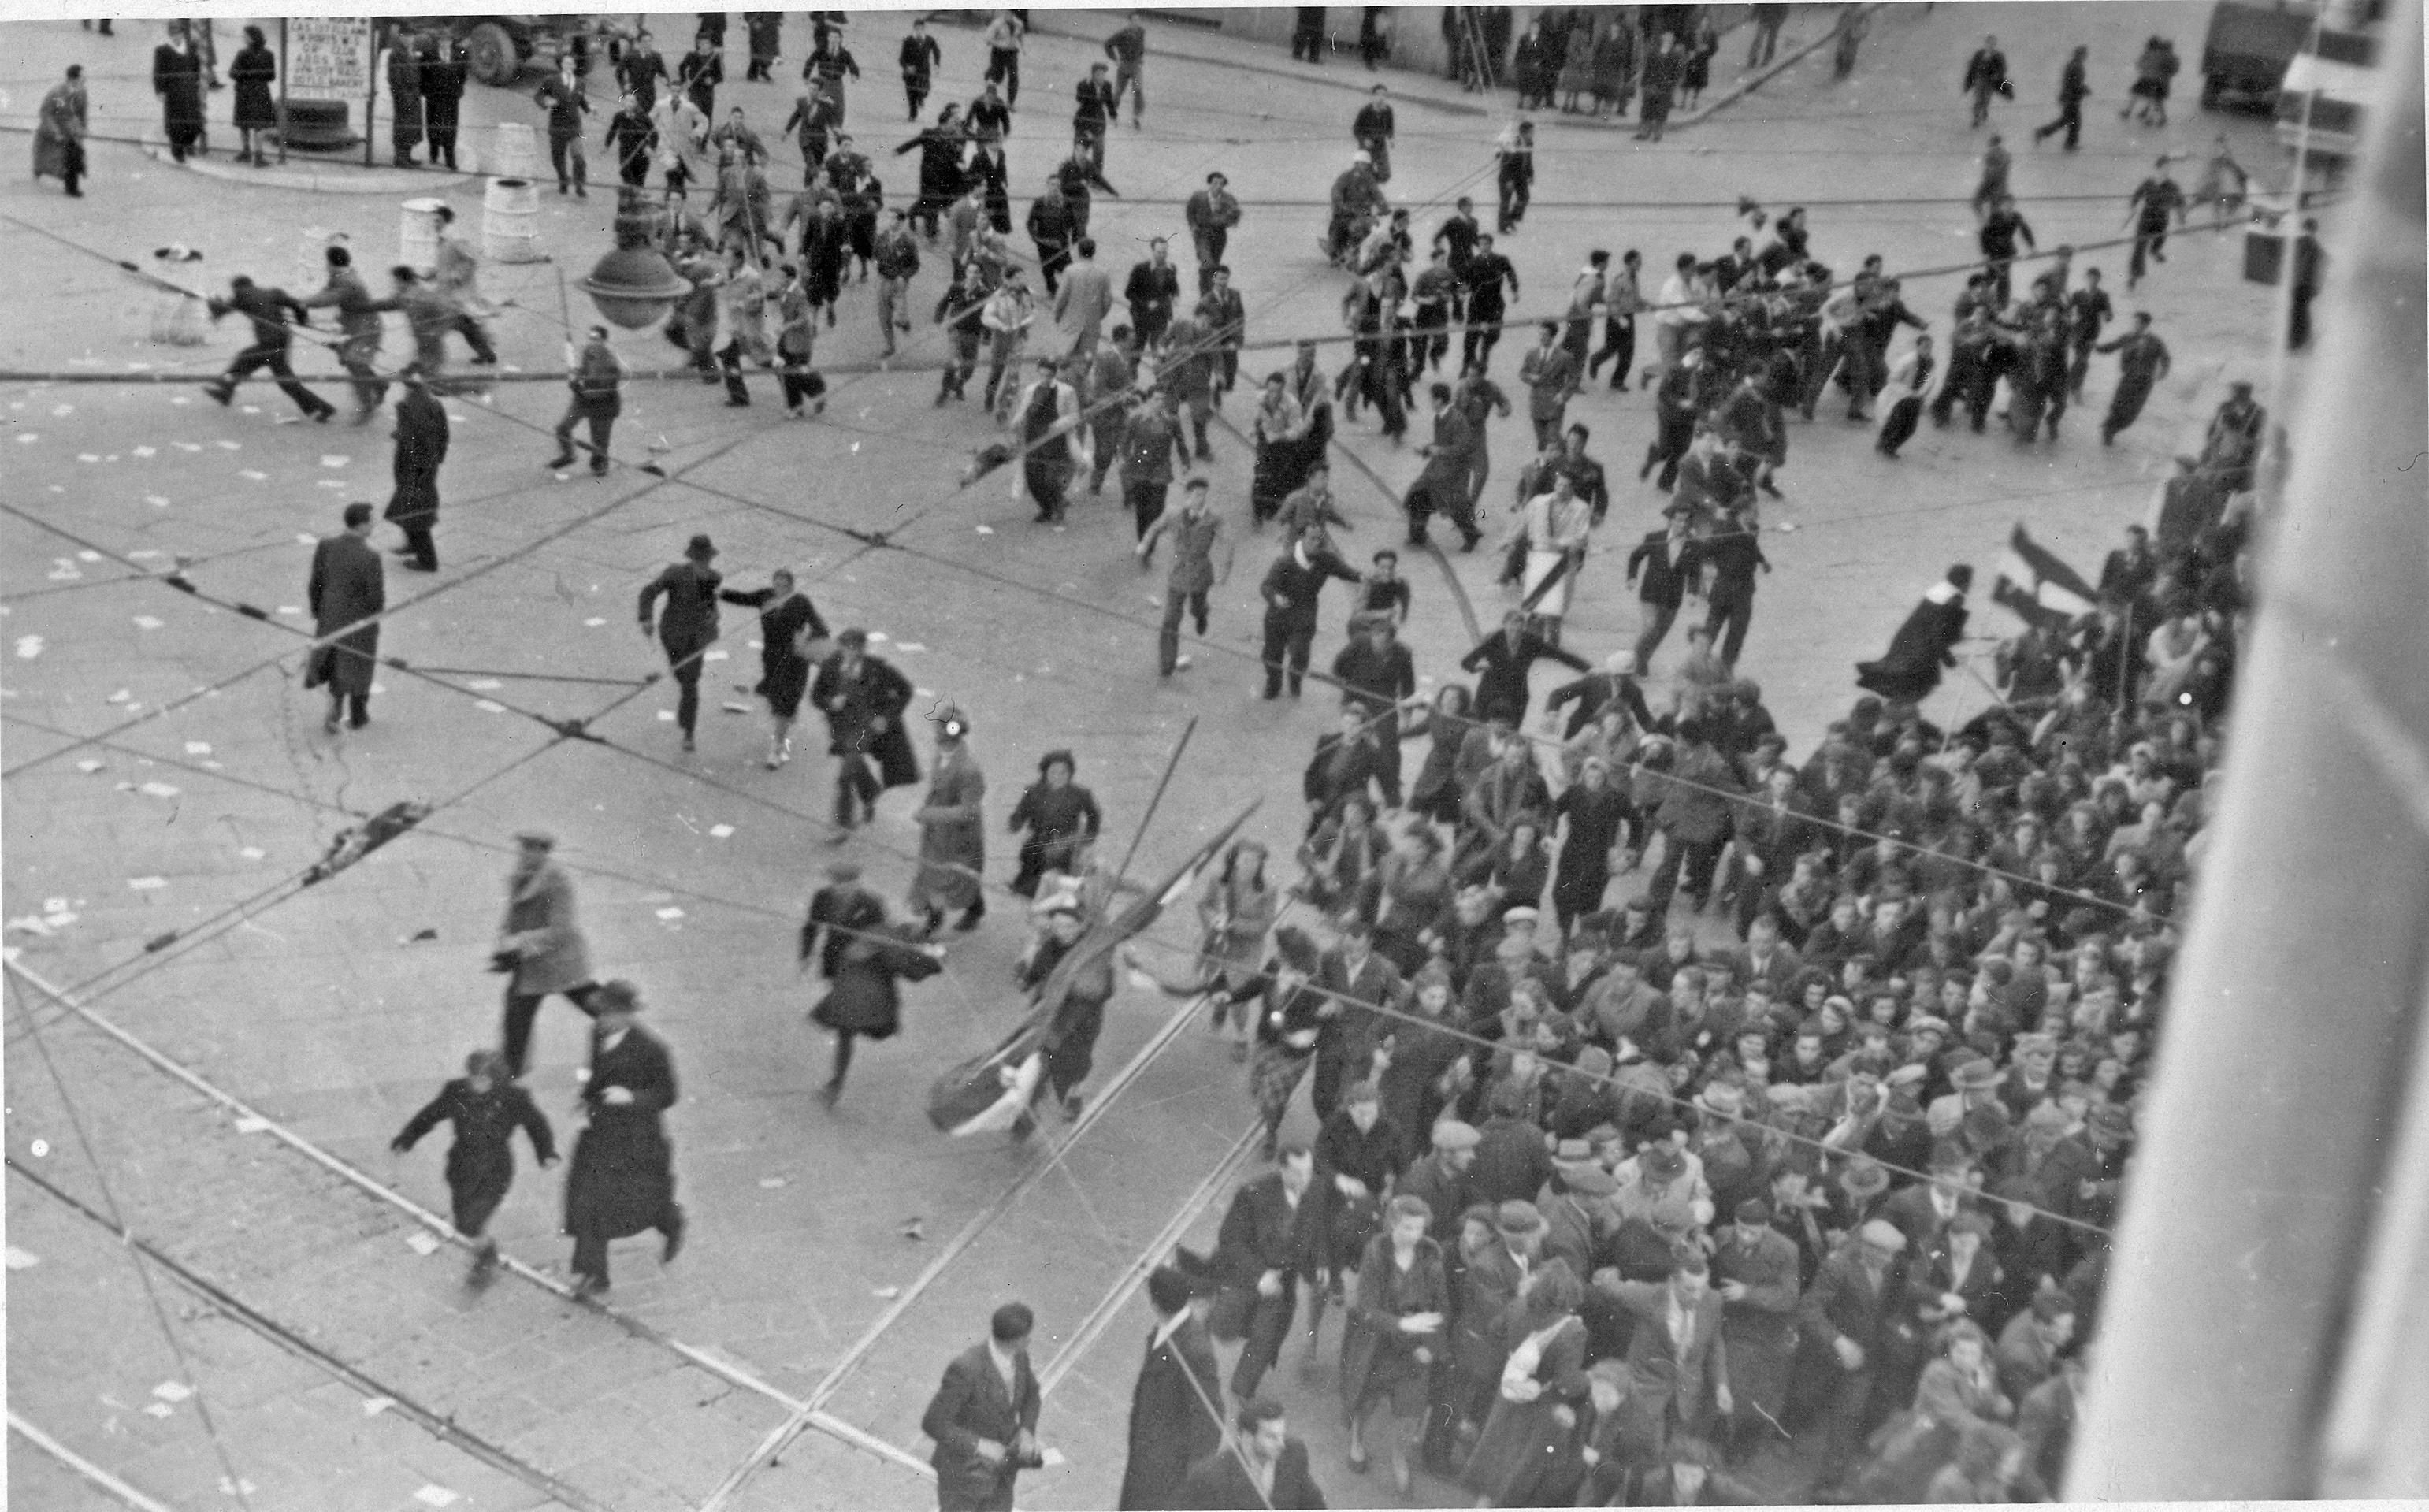 People running away from godzilla